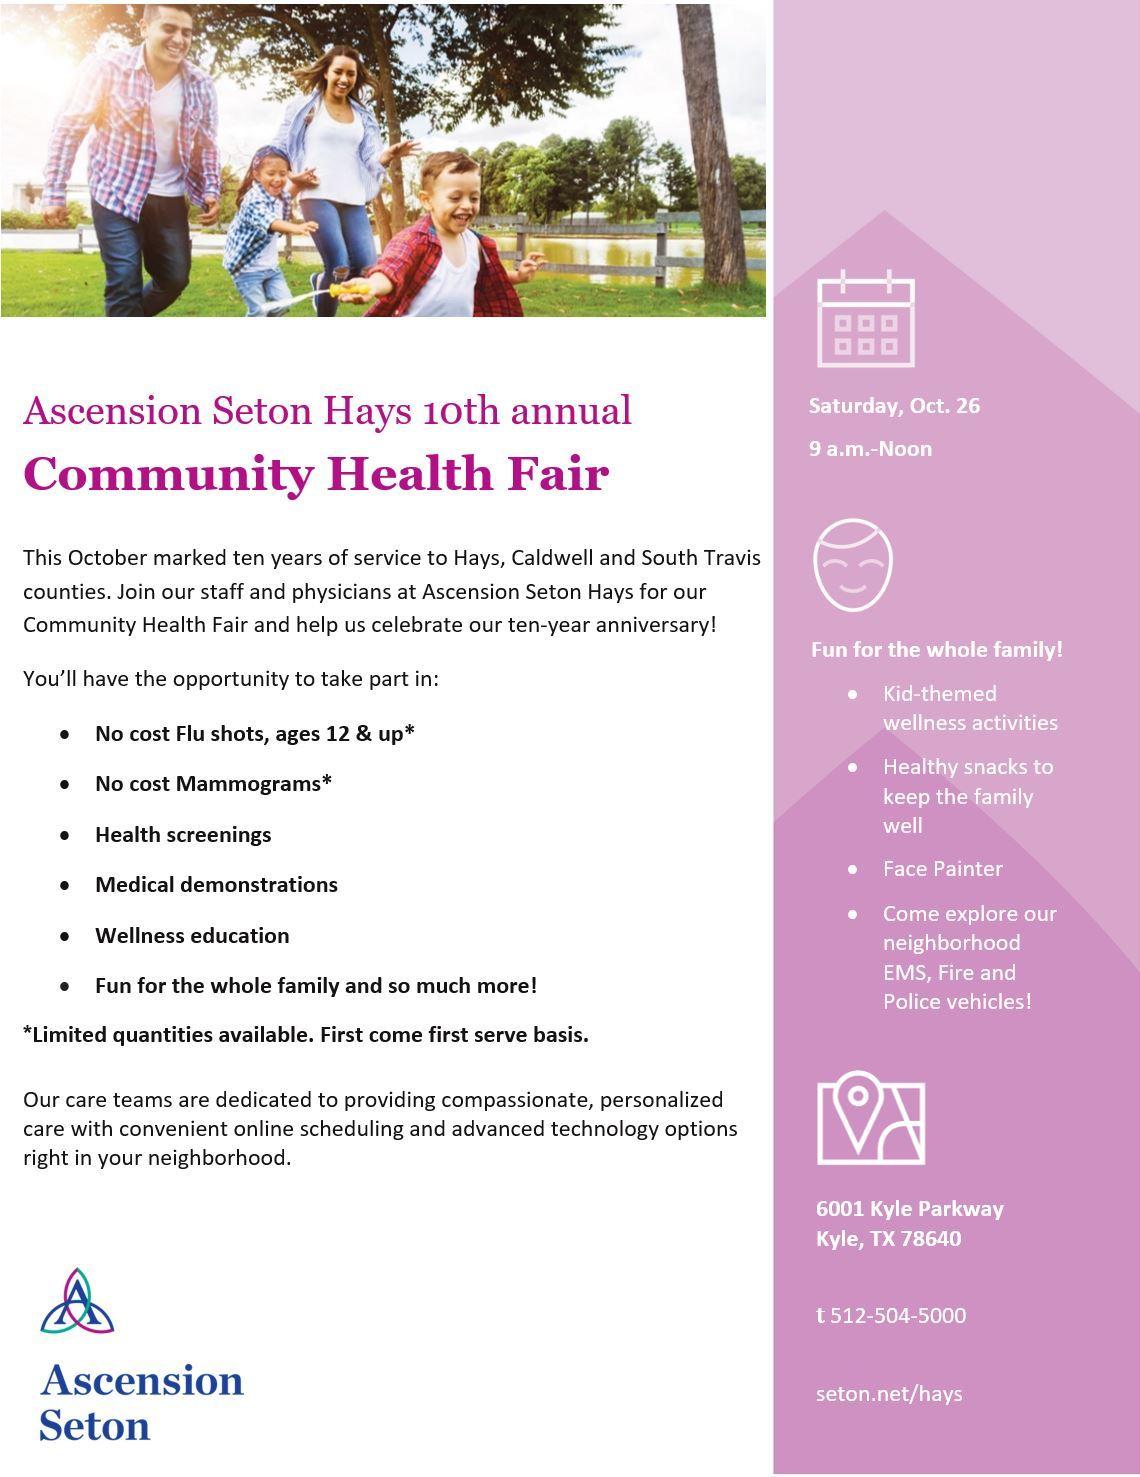 Ascension Seton Hays Community Health Fair Event